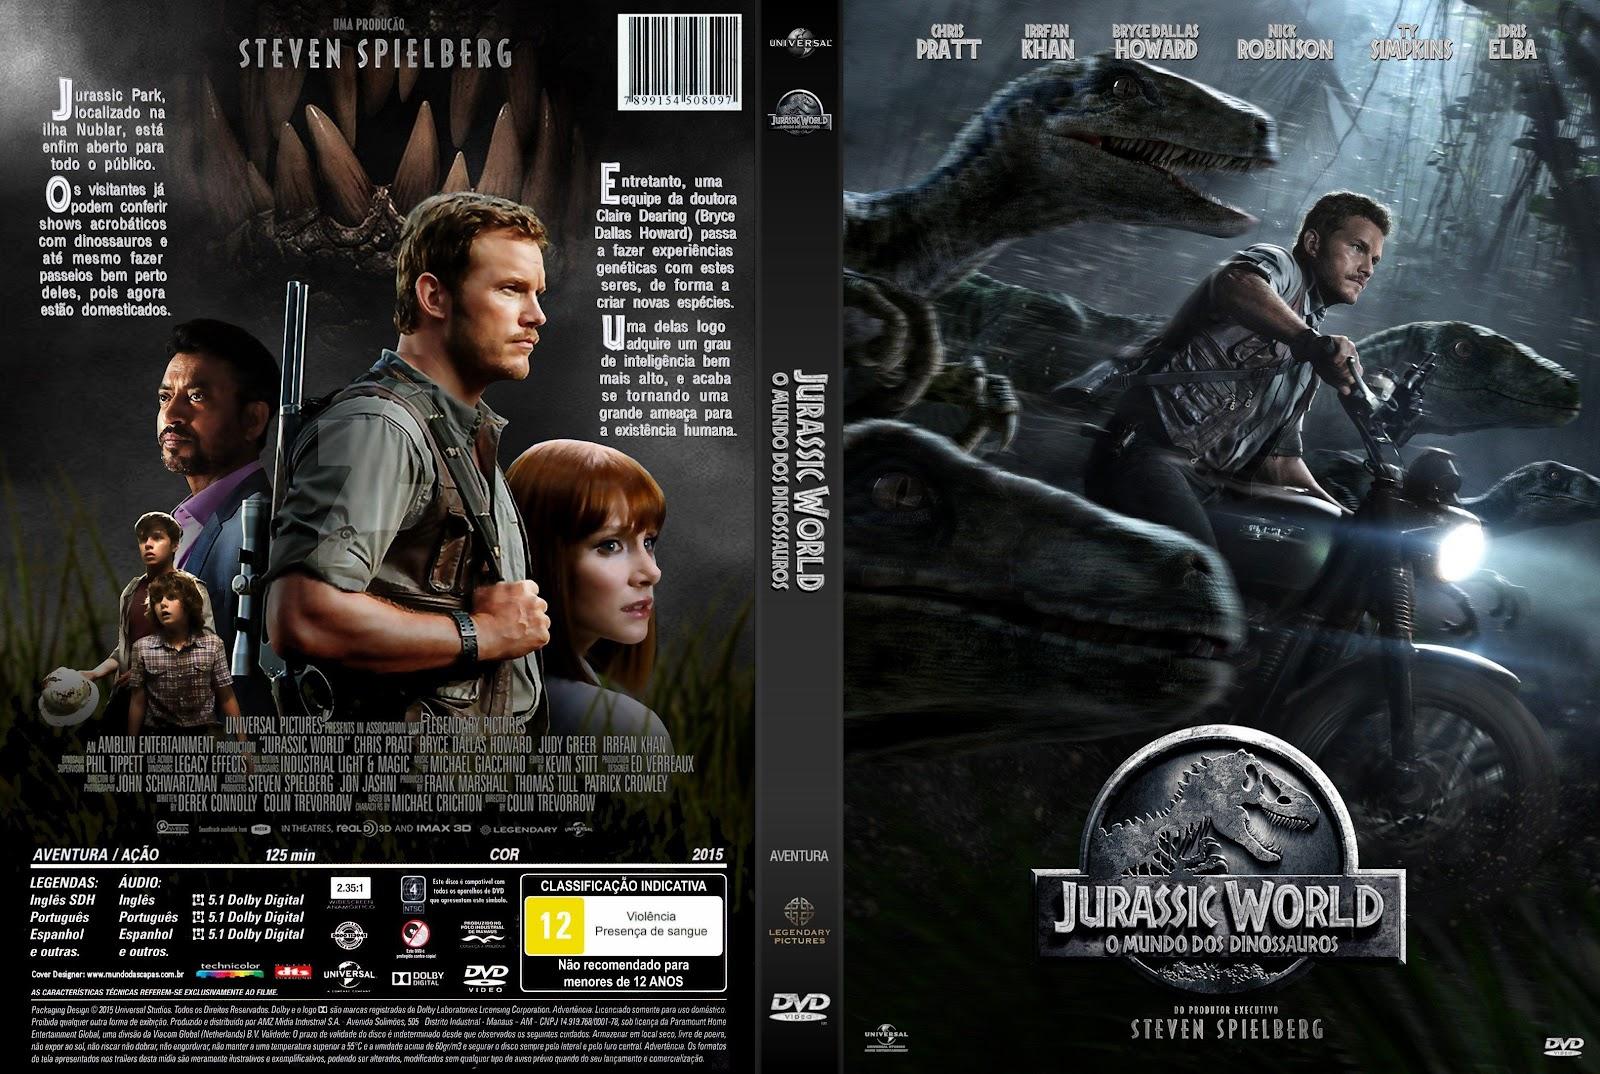 Download Jurassic World O Mundo dos Dinossauros DVD-R Jurassic 2BWorld 2B  2BO 2BMundo 2BDos 2BDinossauros